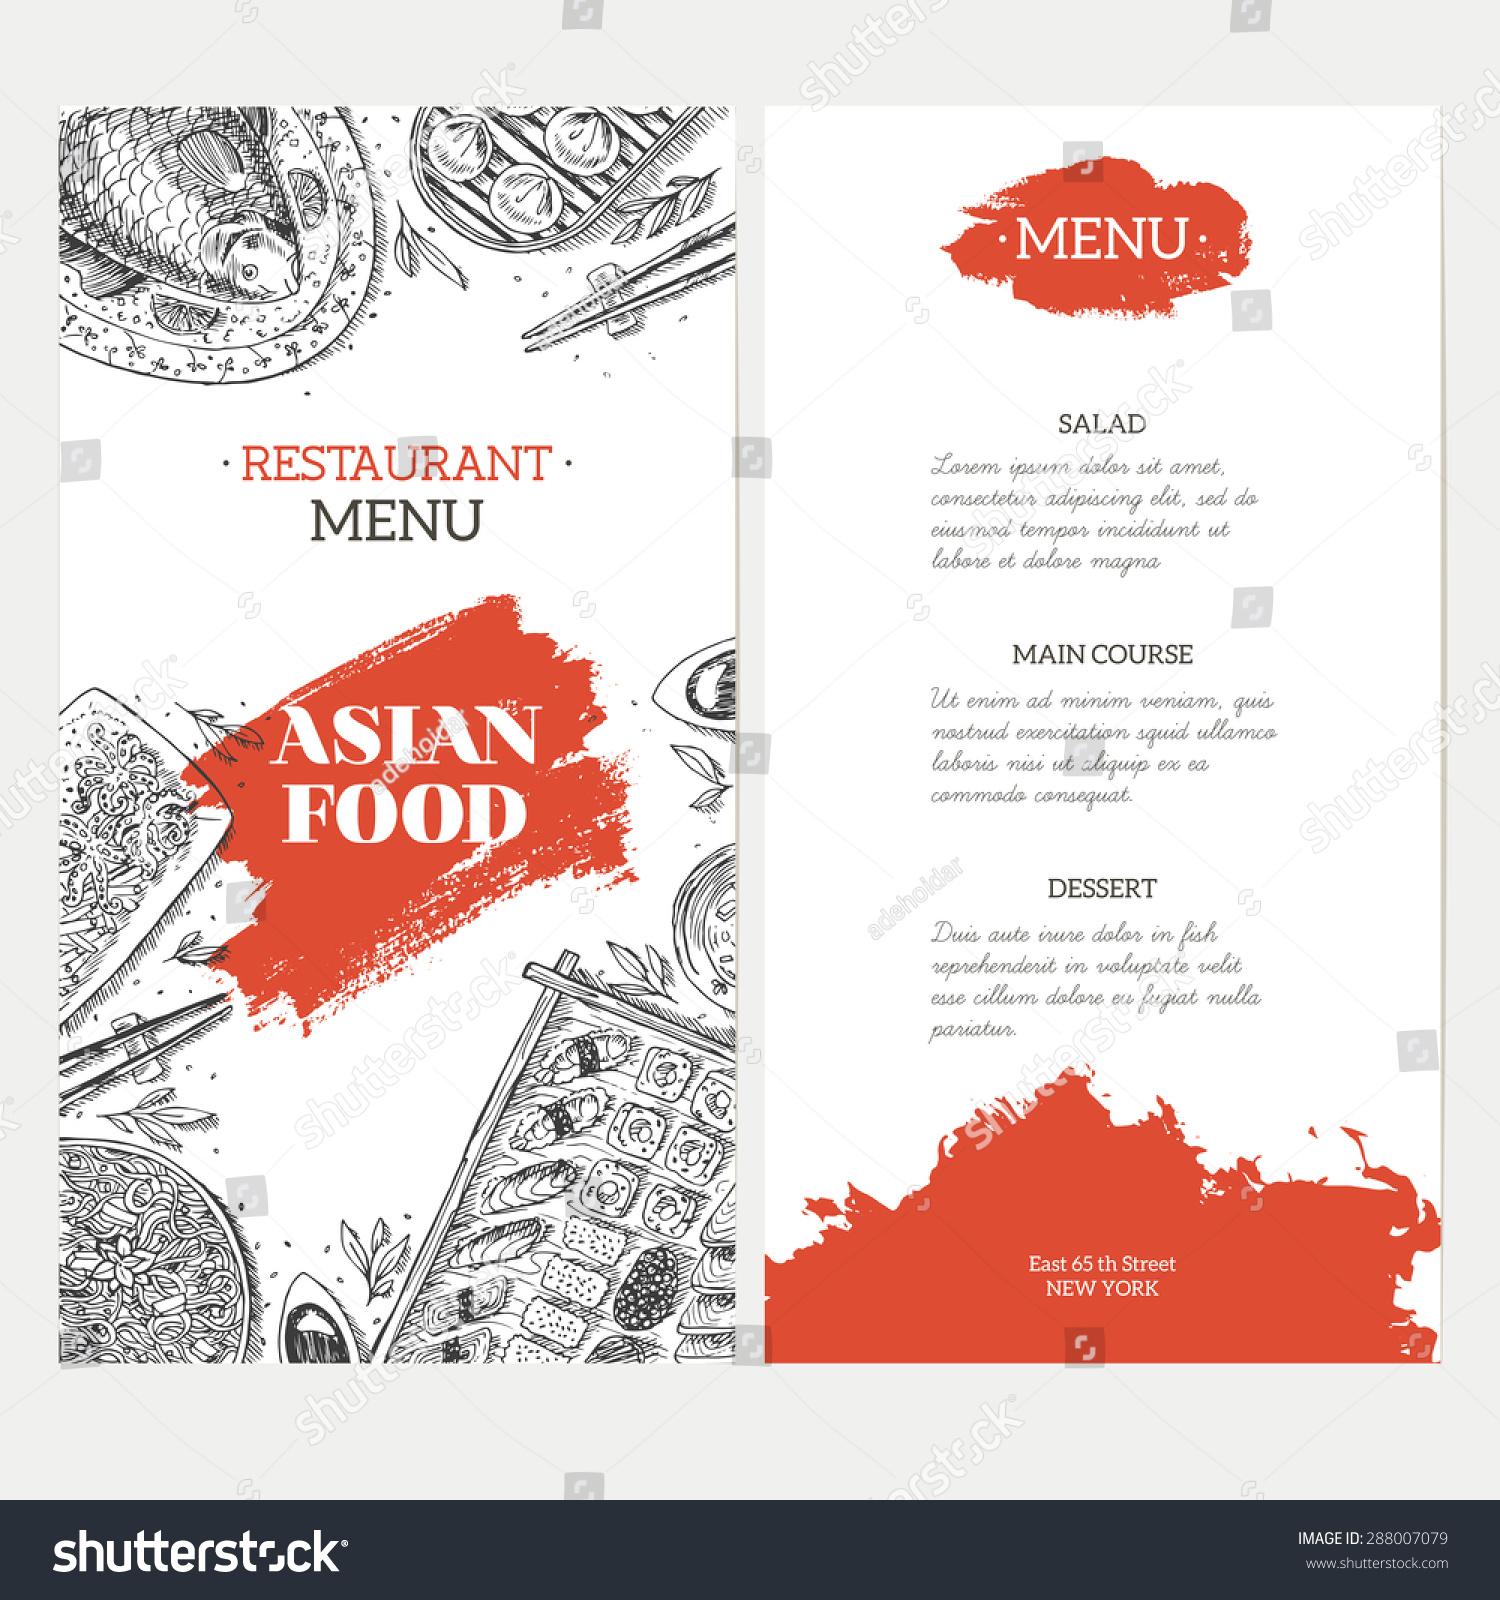 asian food menu template linear graphic vector. Black Bedroom Furniture Sets. Home Design Ideas